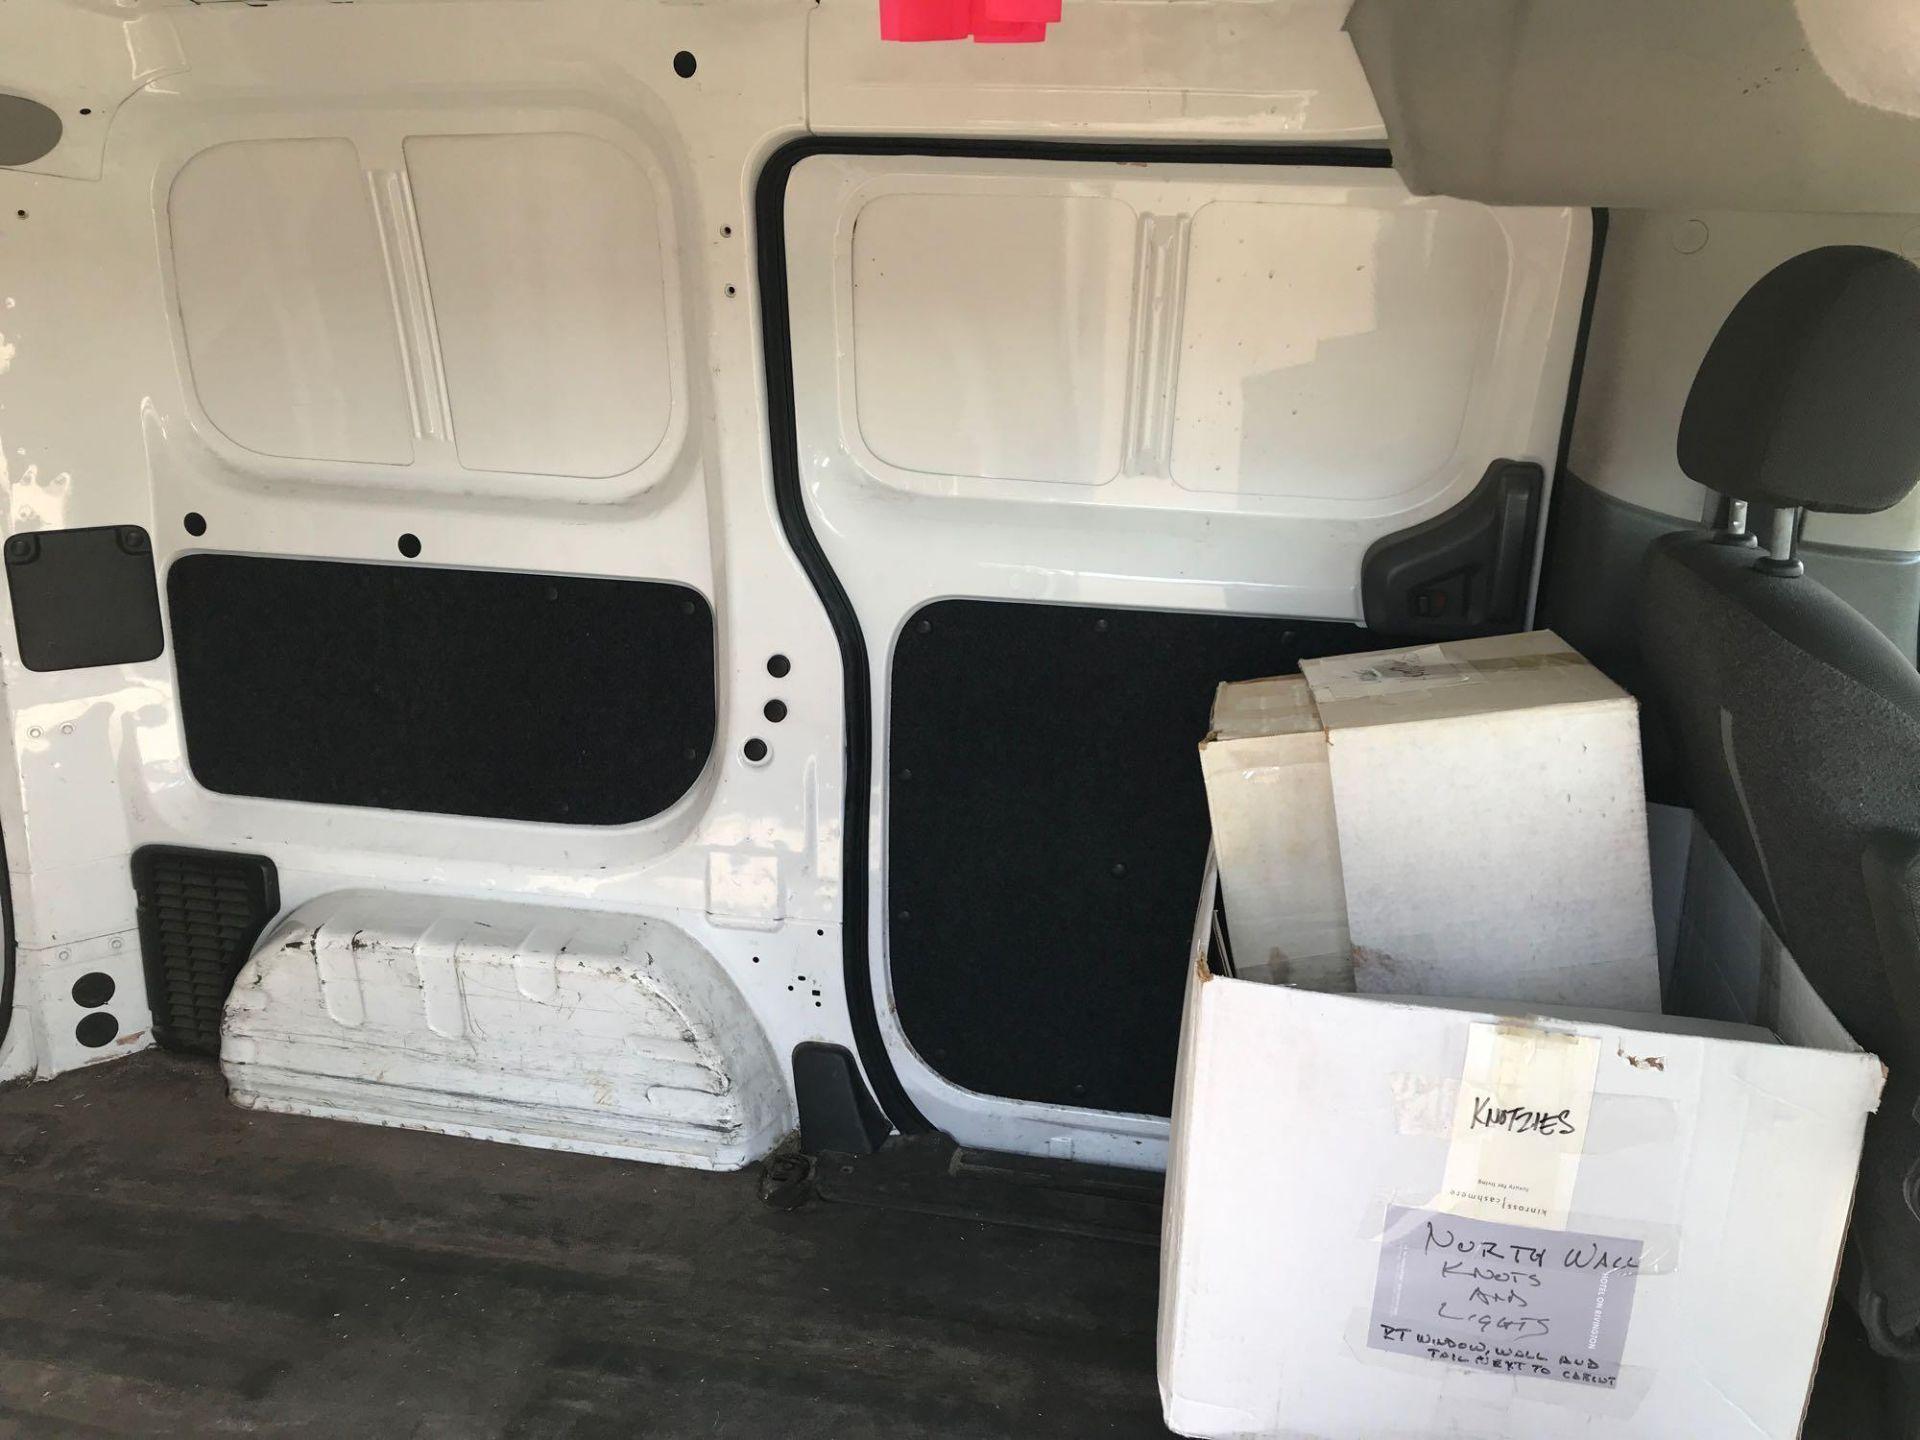 2013 Nissan NV200 Delivery Van - Image 27 of 54